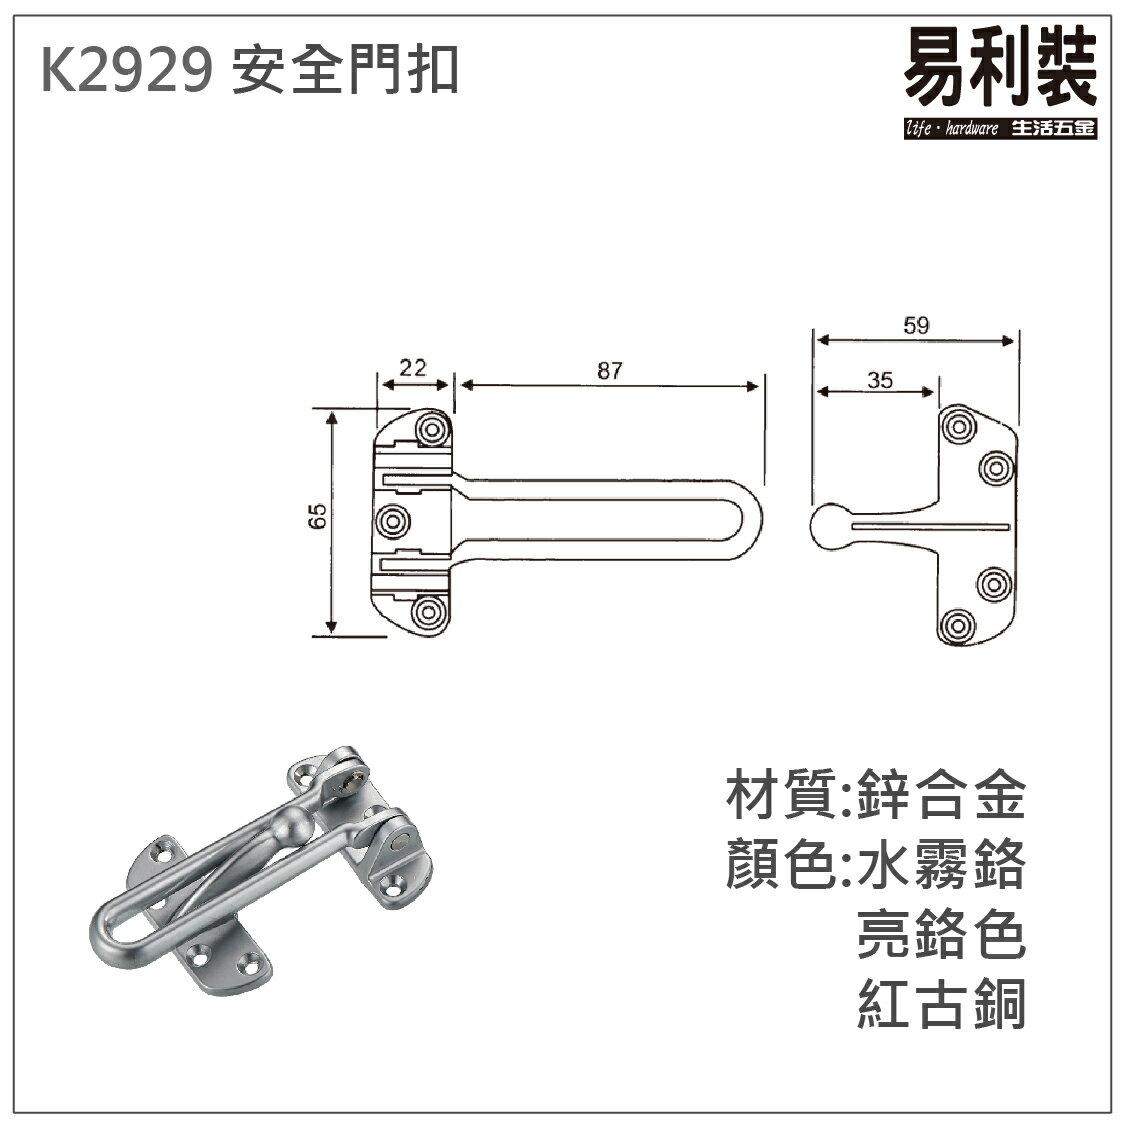 K2929 安全門扣  易利裝生活五金 安全鎖 2